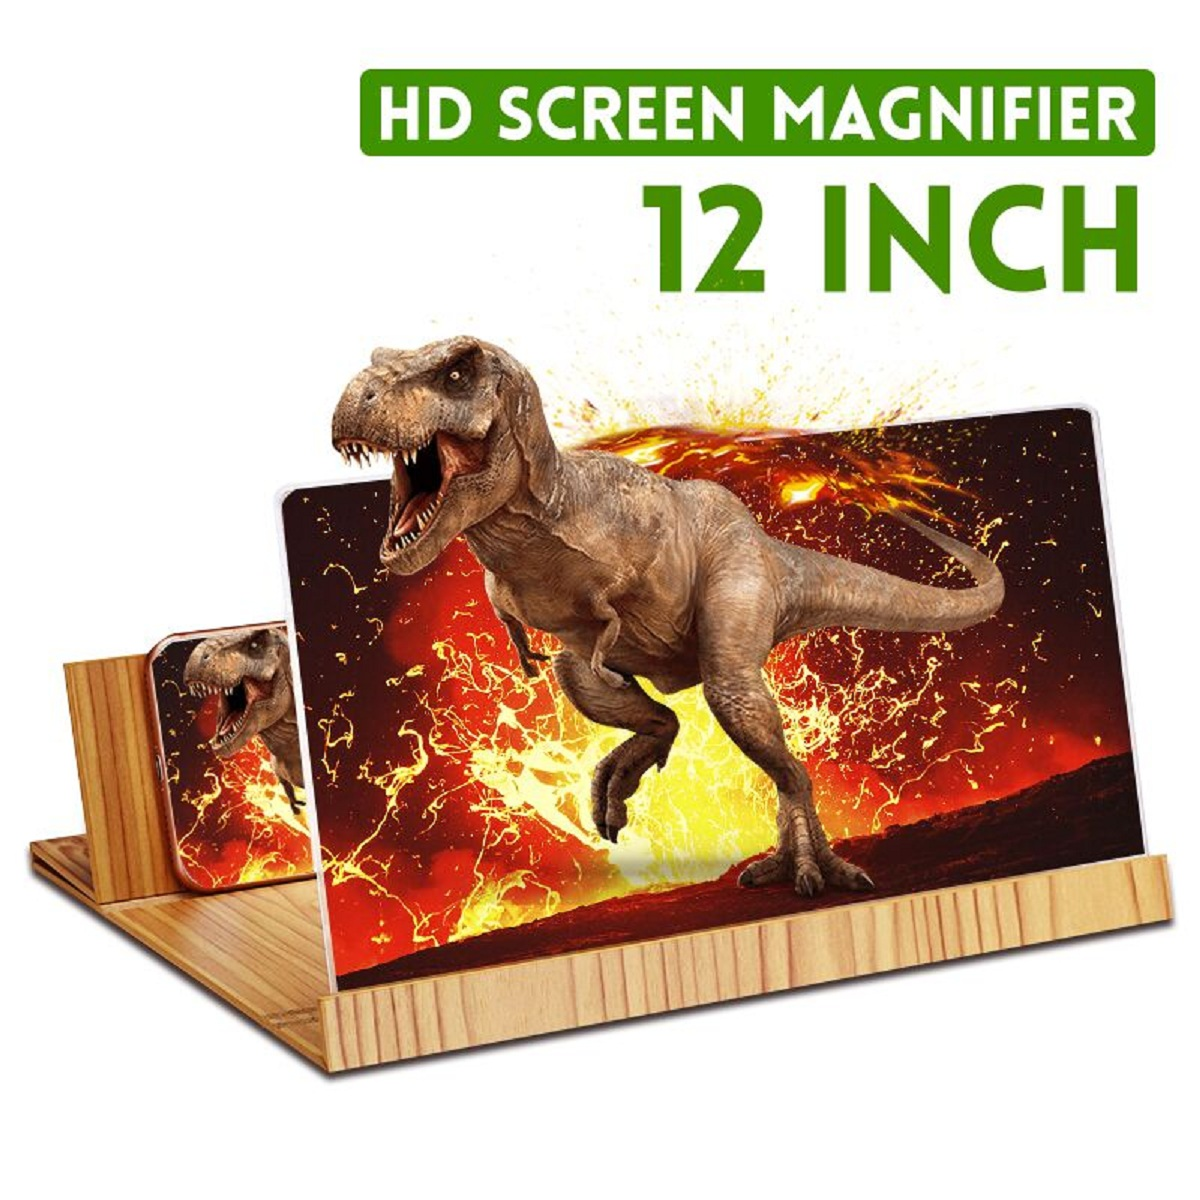 12inch 3D Phone Screen Magnifier Amplifier Folding Design HD Video Magnifying Glass Watch 3d Movies Smart Phone Bracket Holder